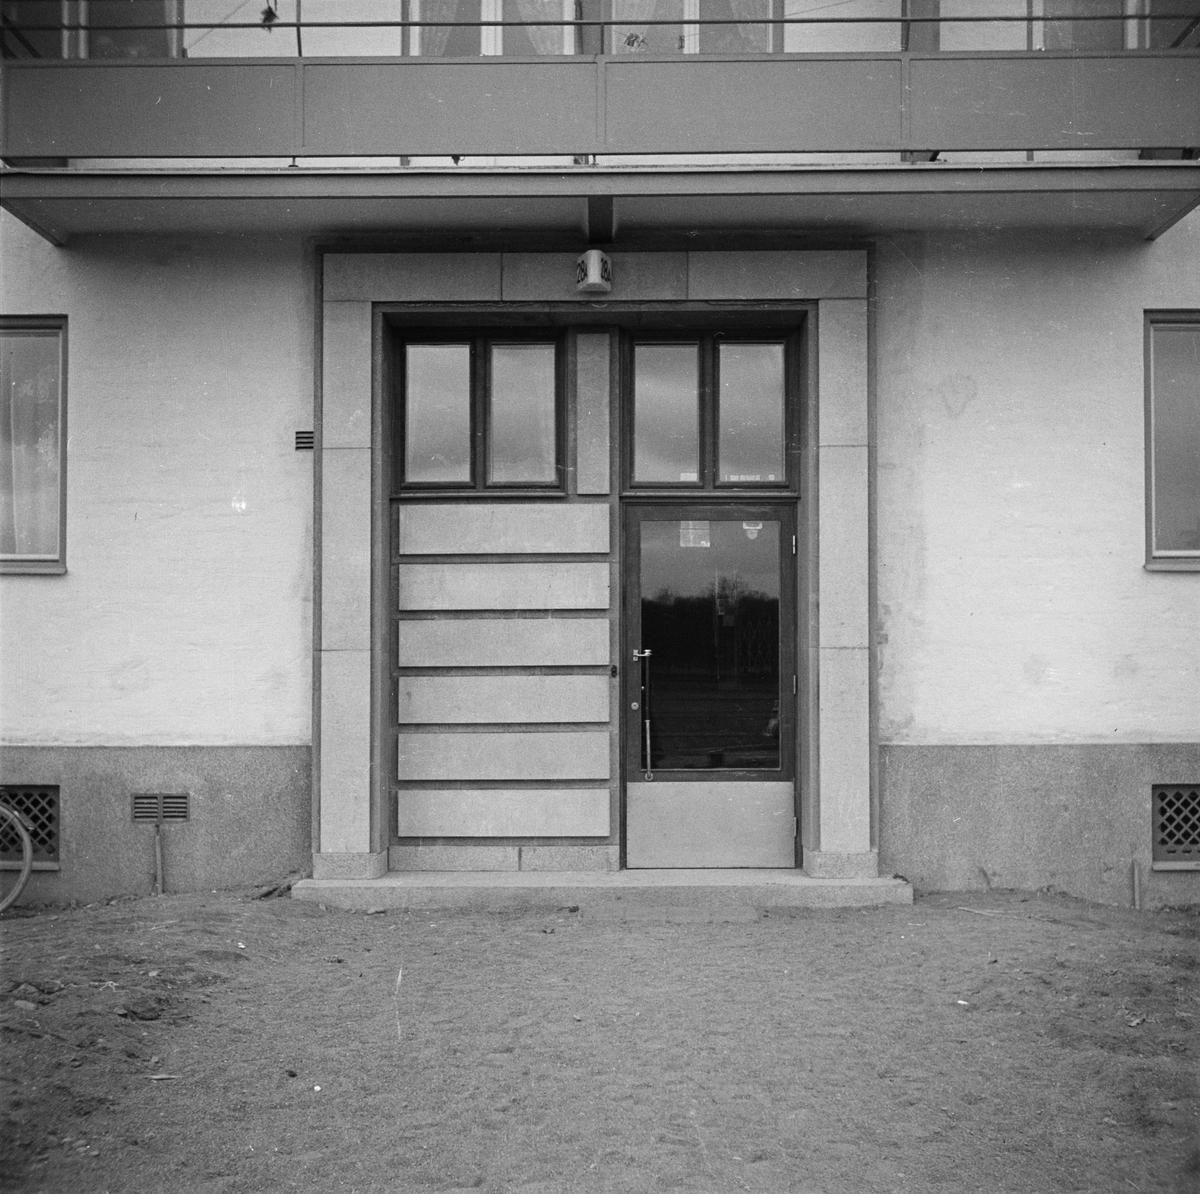 Port i flerbostadshus, sannolikt Uppsala 1939